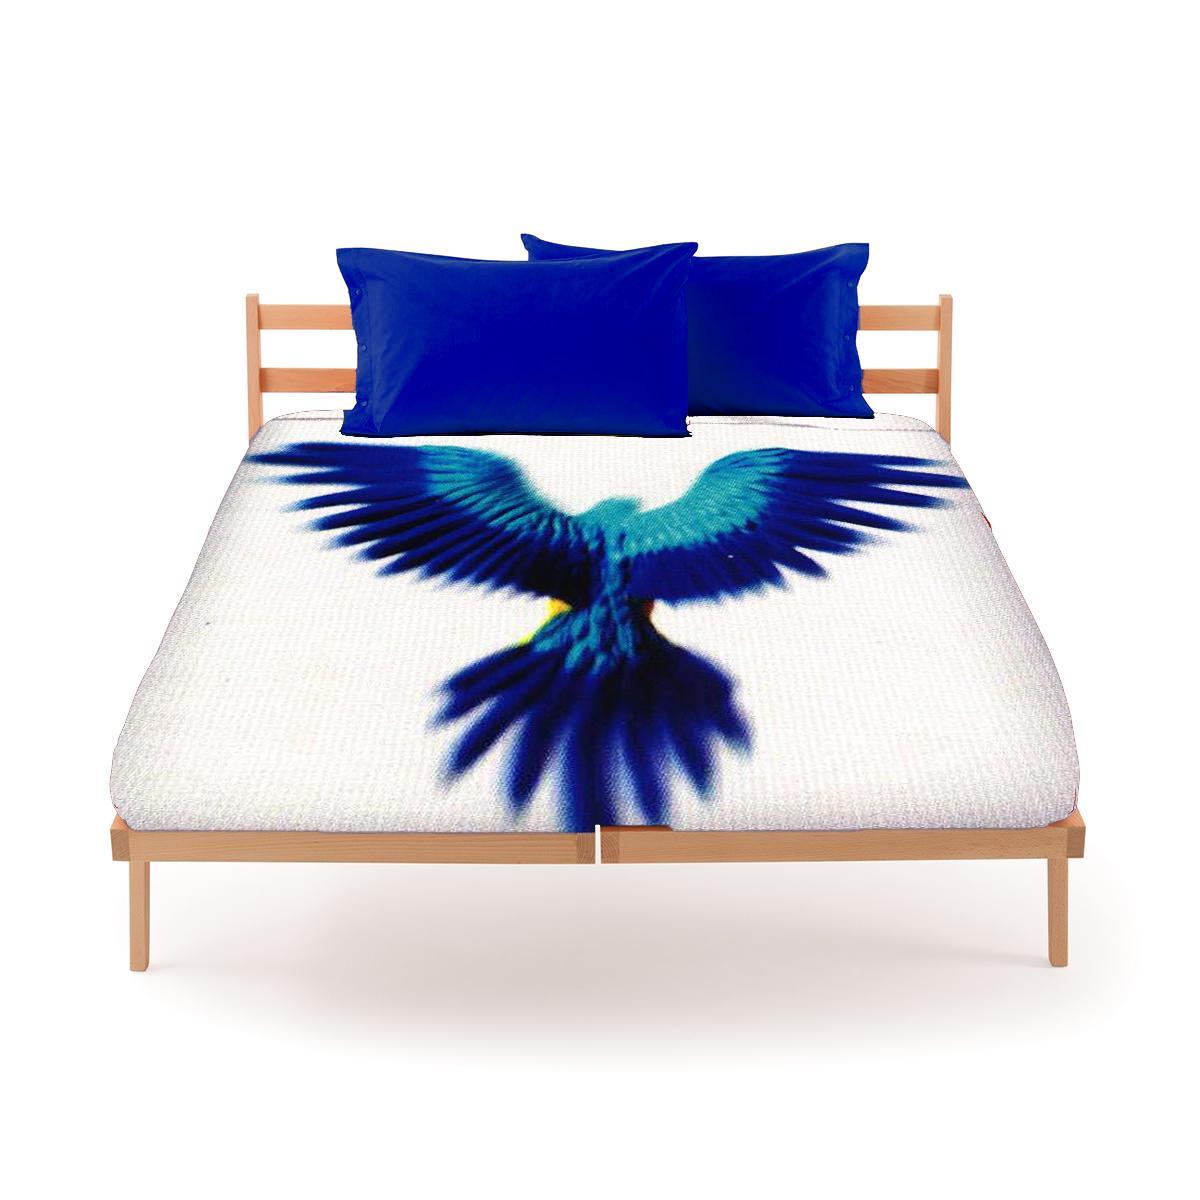 Set lenzuola bassetti by gardone per letto matrimoniale fondo bianco pappagallo - Set letto matrimoniale ...